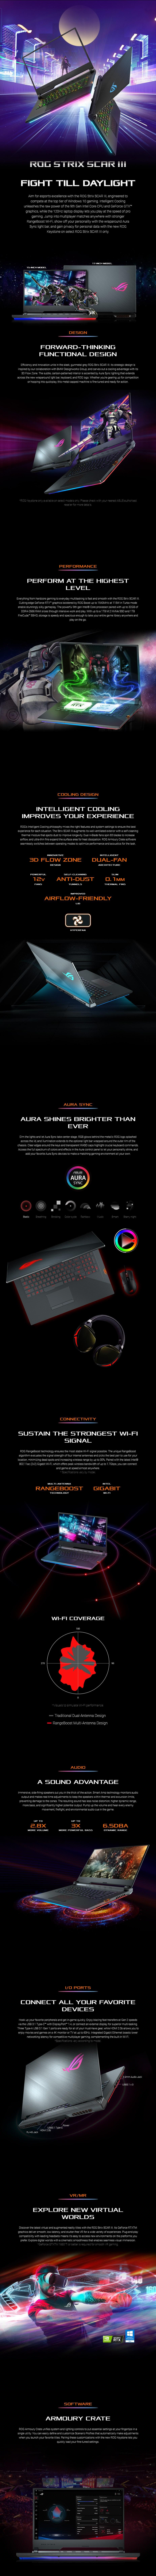 asus-rog-strix-scar-iii-gl531gu-156-120hz-gaming-laptop-i7-16gb-512gb-1660ti-ac26512-6.jpg